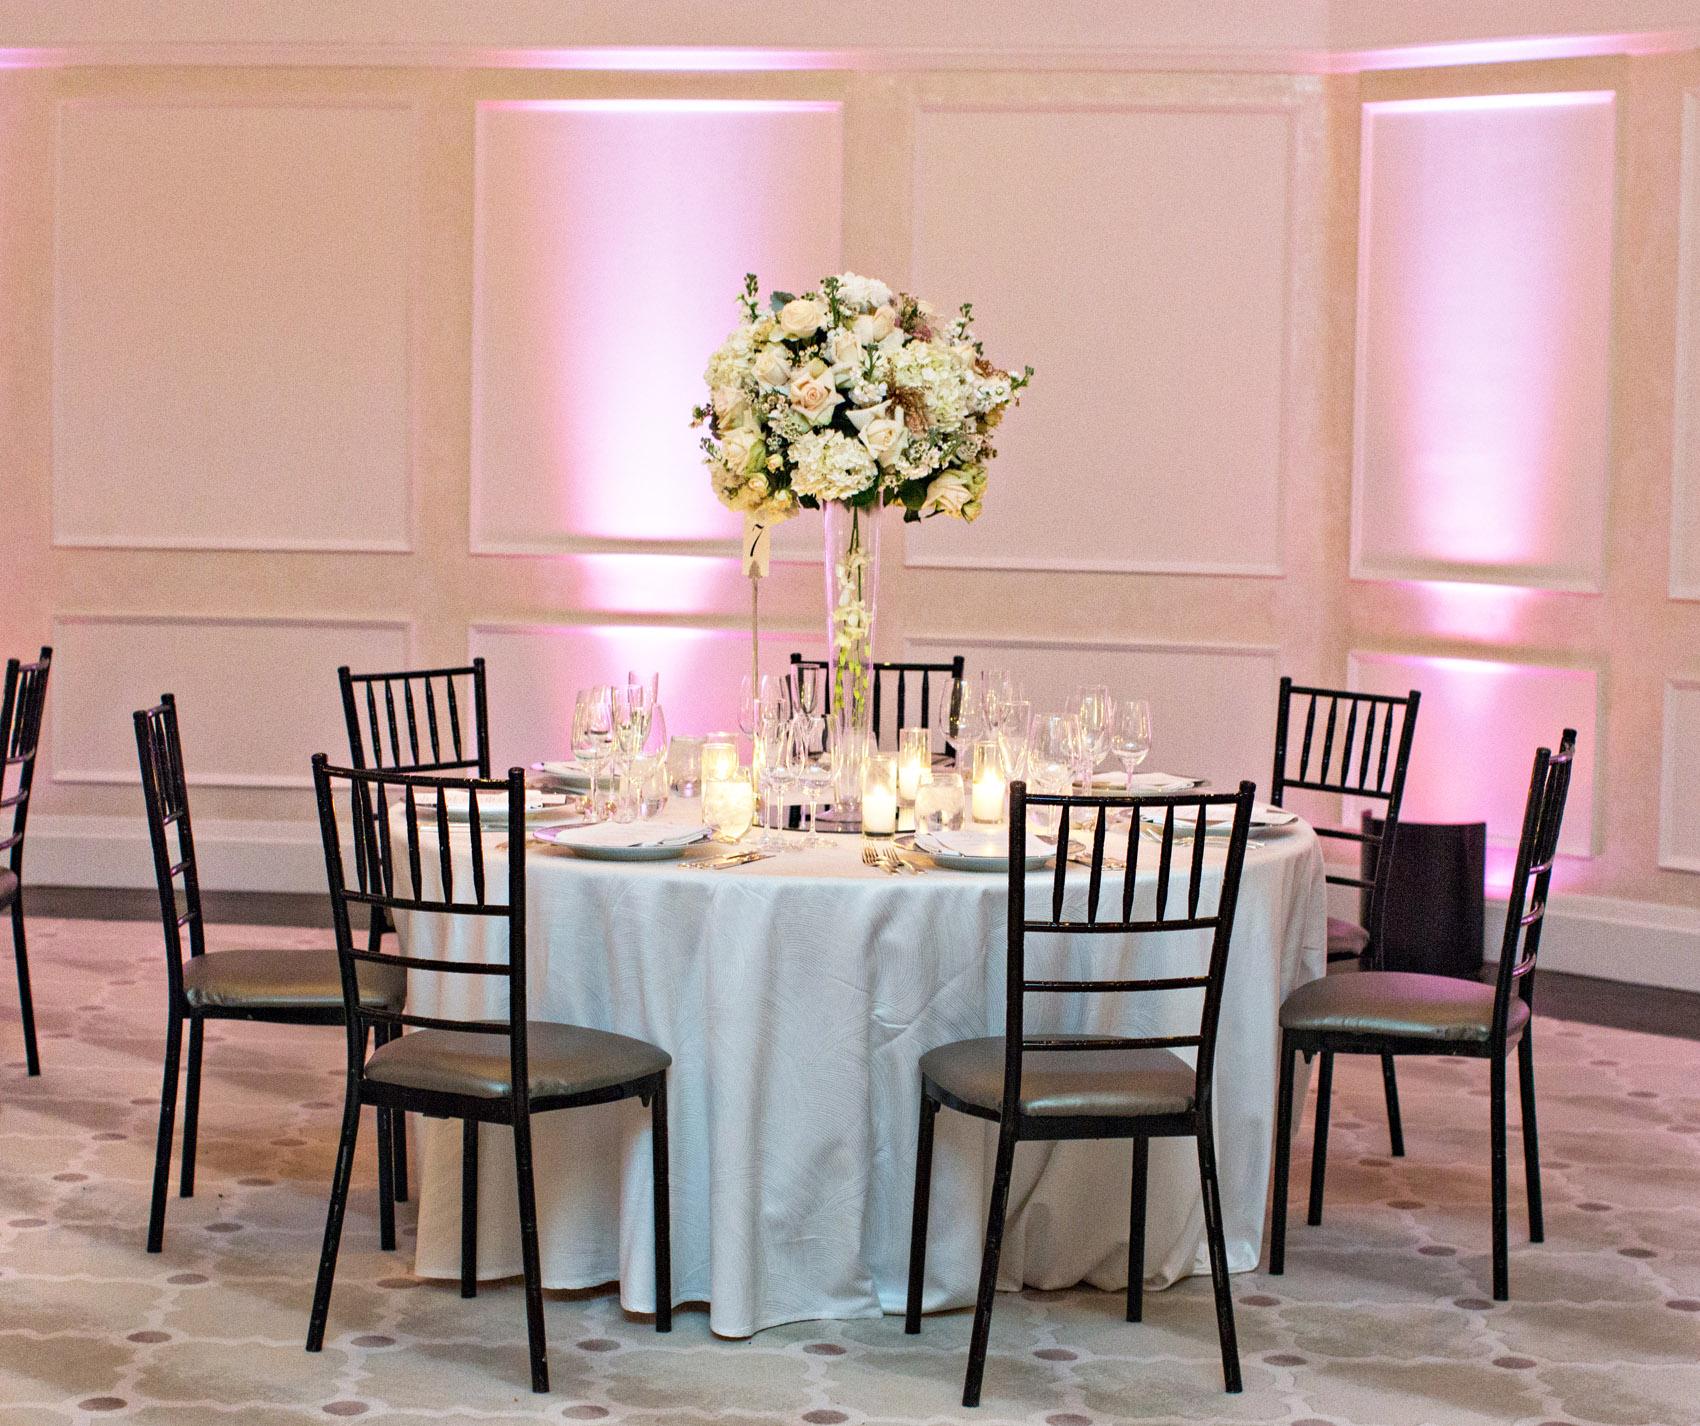 127Hotel Bel Air Wedding Joy Marie.jpg